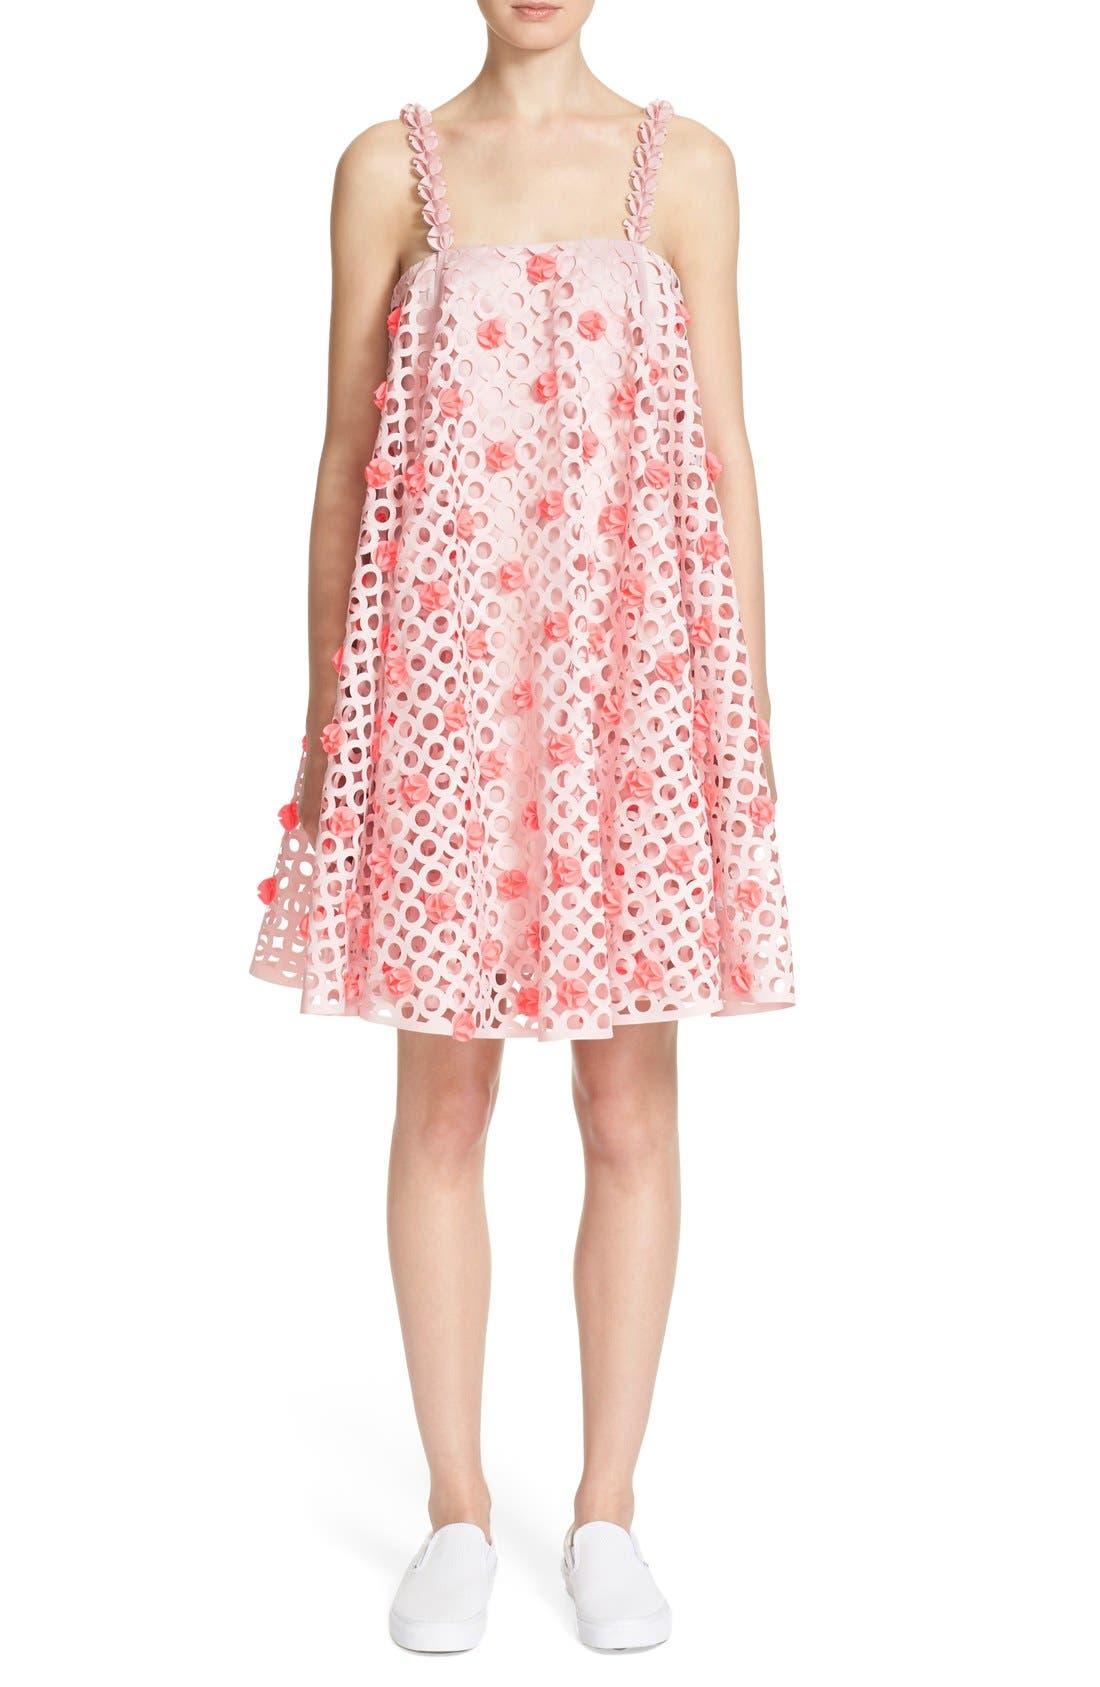 Laser Cut Trapeze Dress,                         Main,                         color, Ashy Pink/ Acid Pink